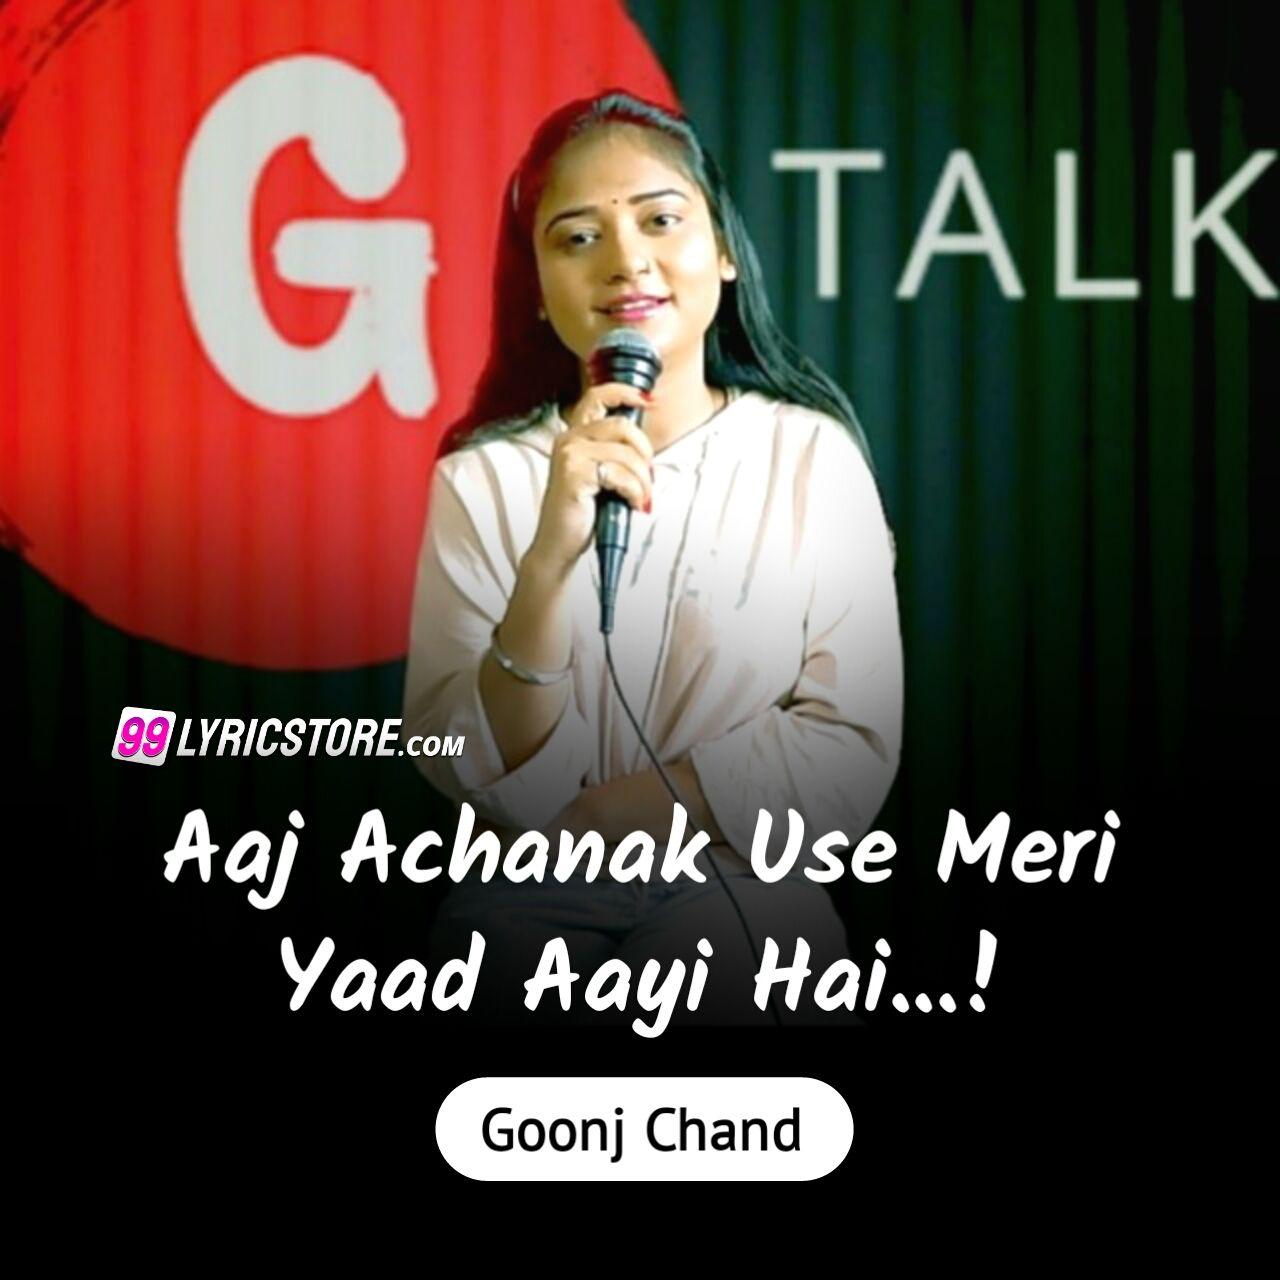 This beautiful poem 'Aaj Achanak Use Meri Yaad Aayi Hai' has written and performed by Goonj Chand on G Talk's Platform.